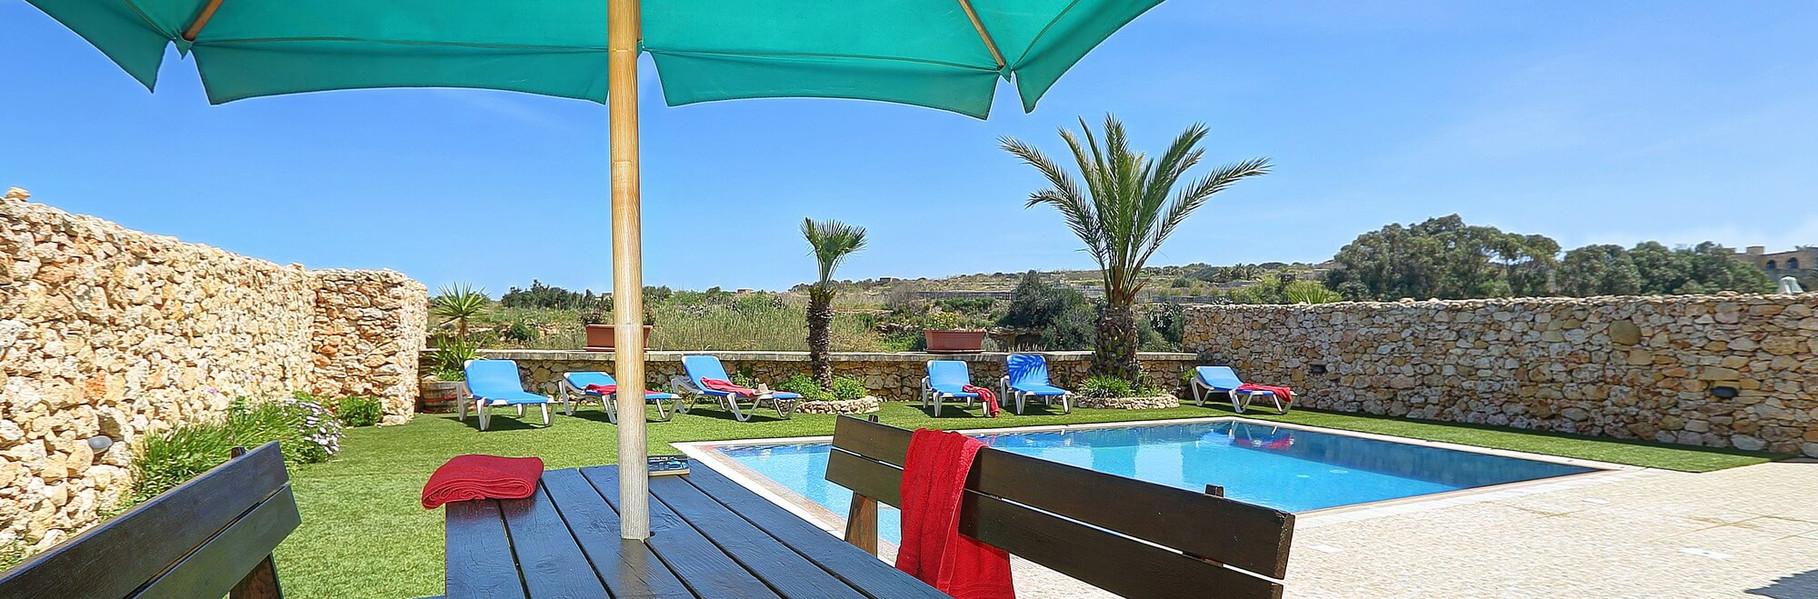 villa-2-terracce.jpg